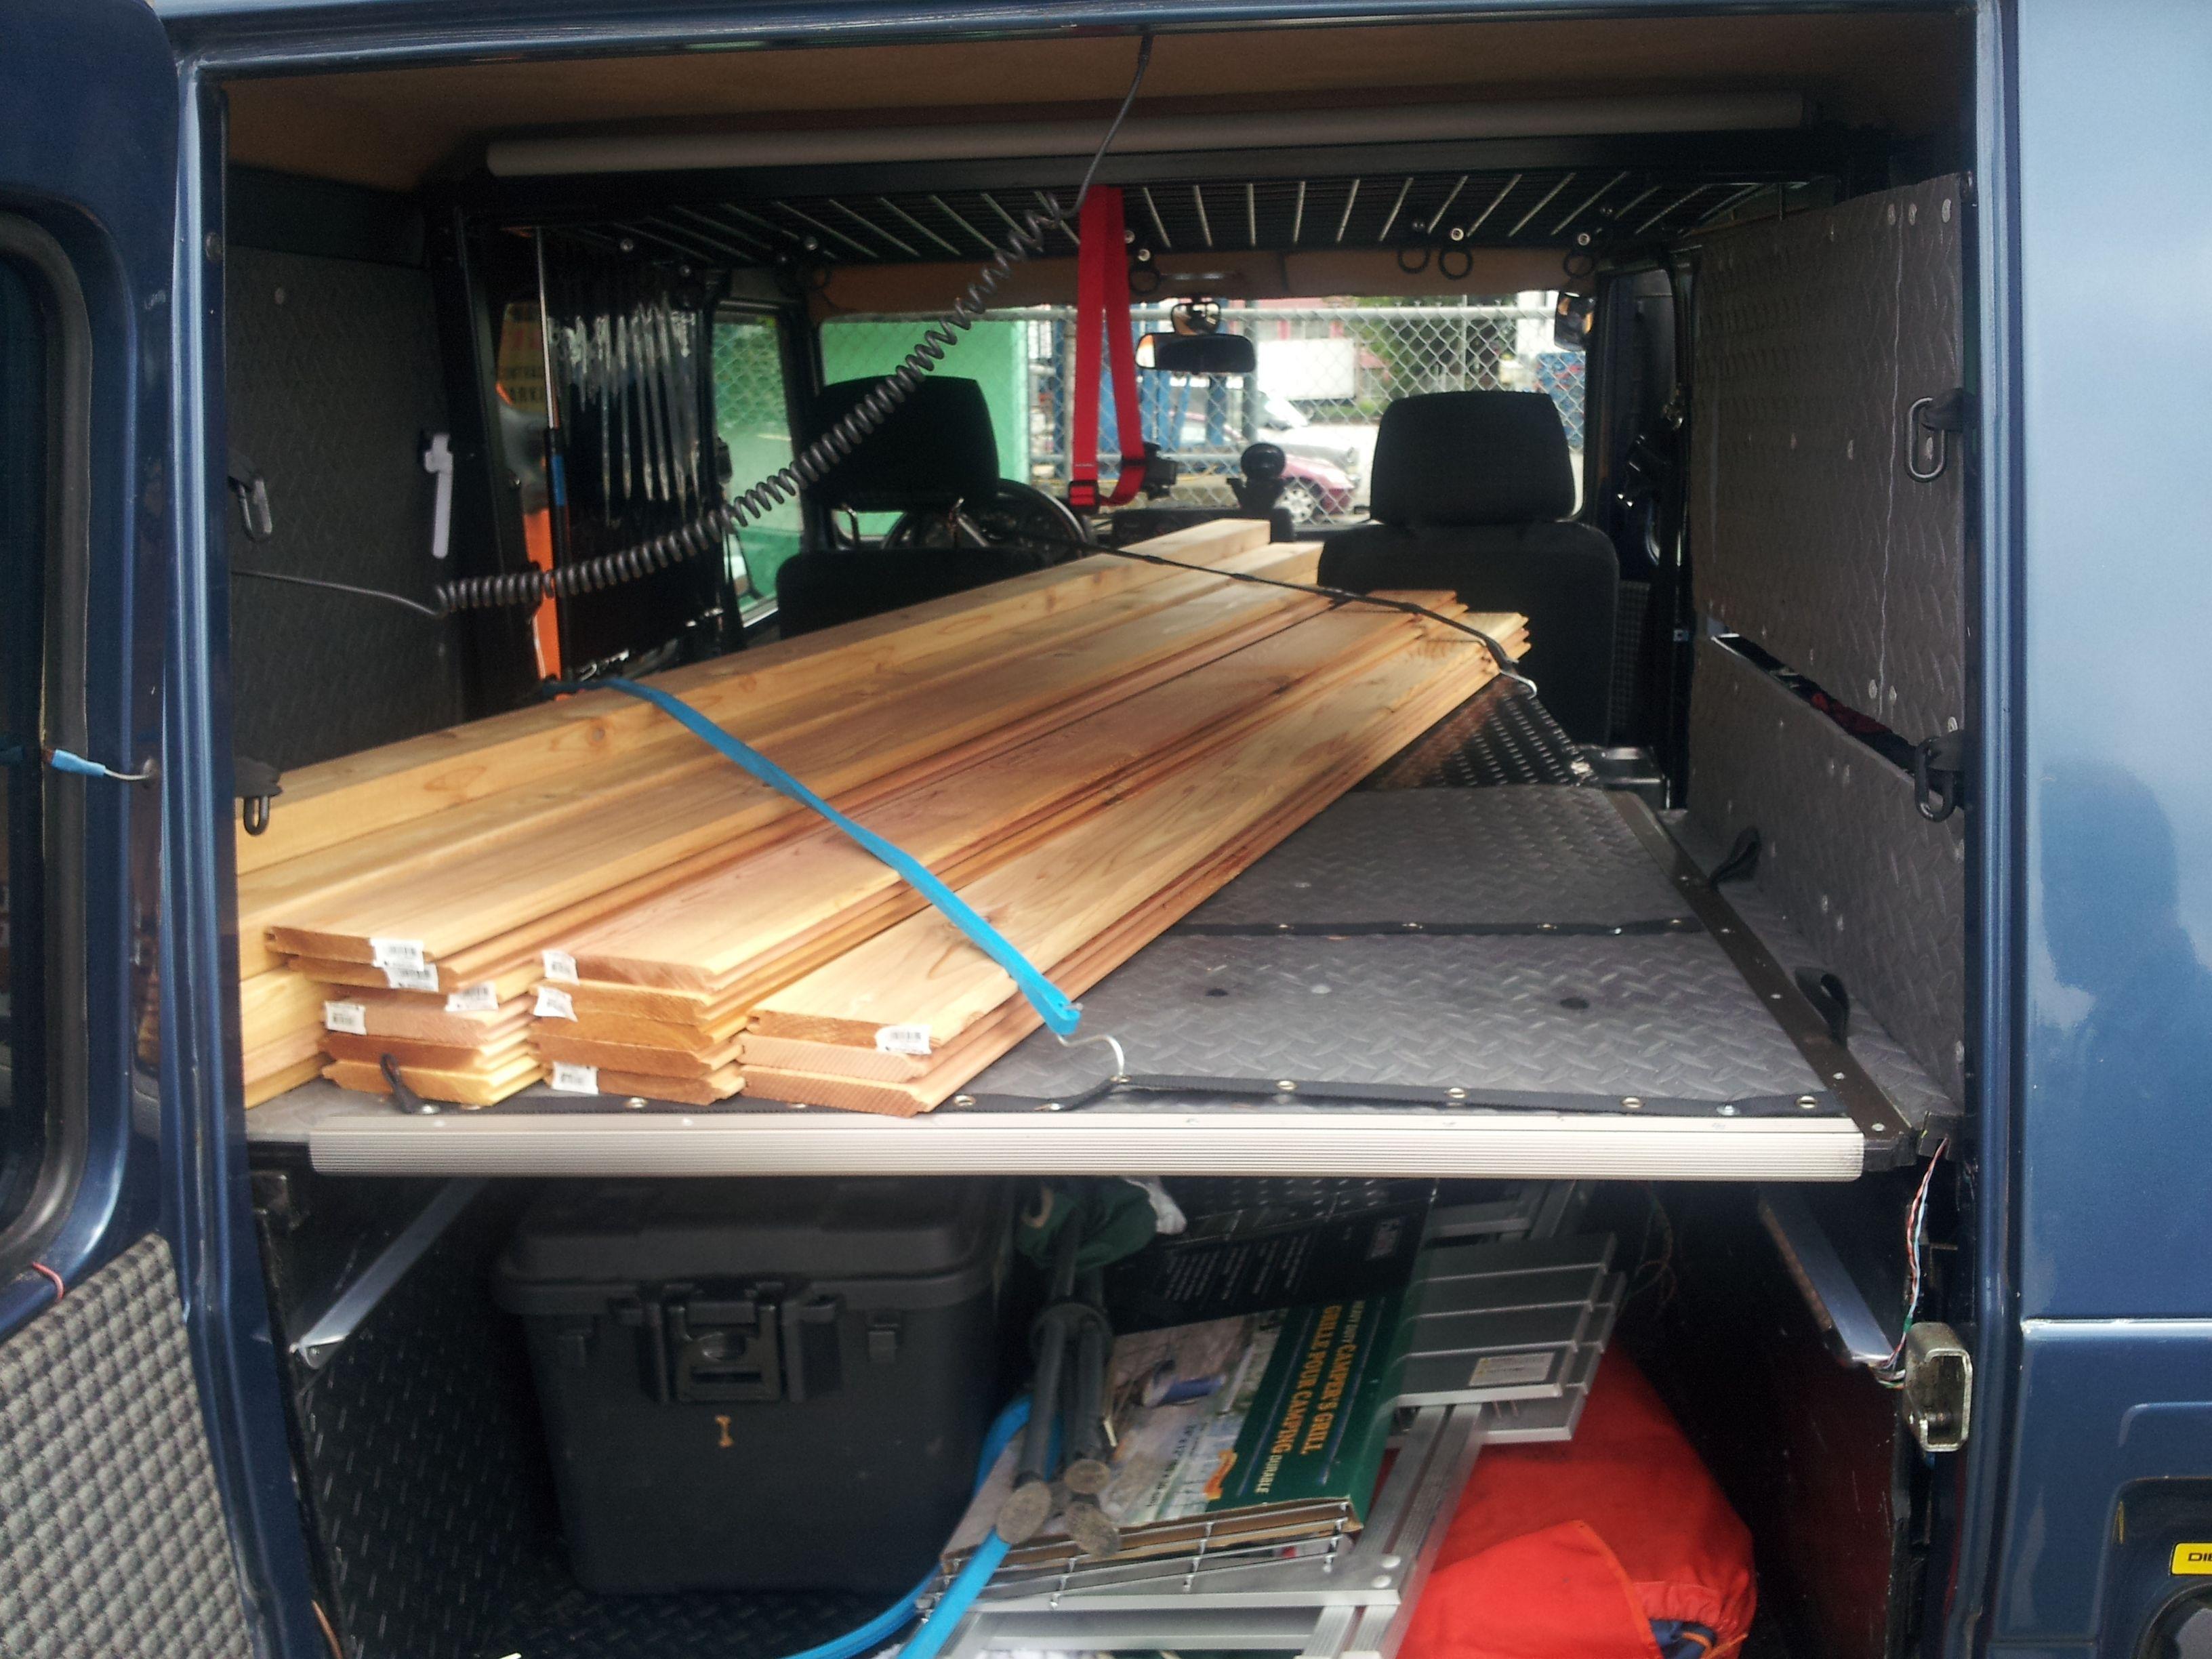 flat interior sleeping platform 8 feet long removable